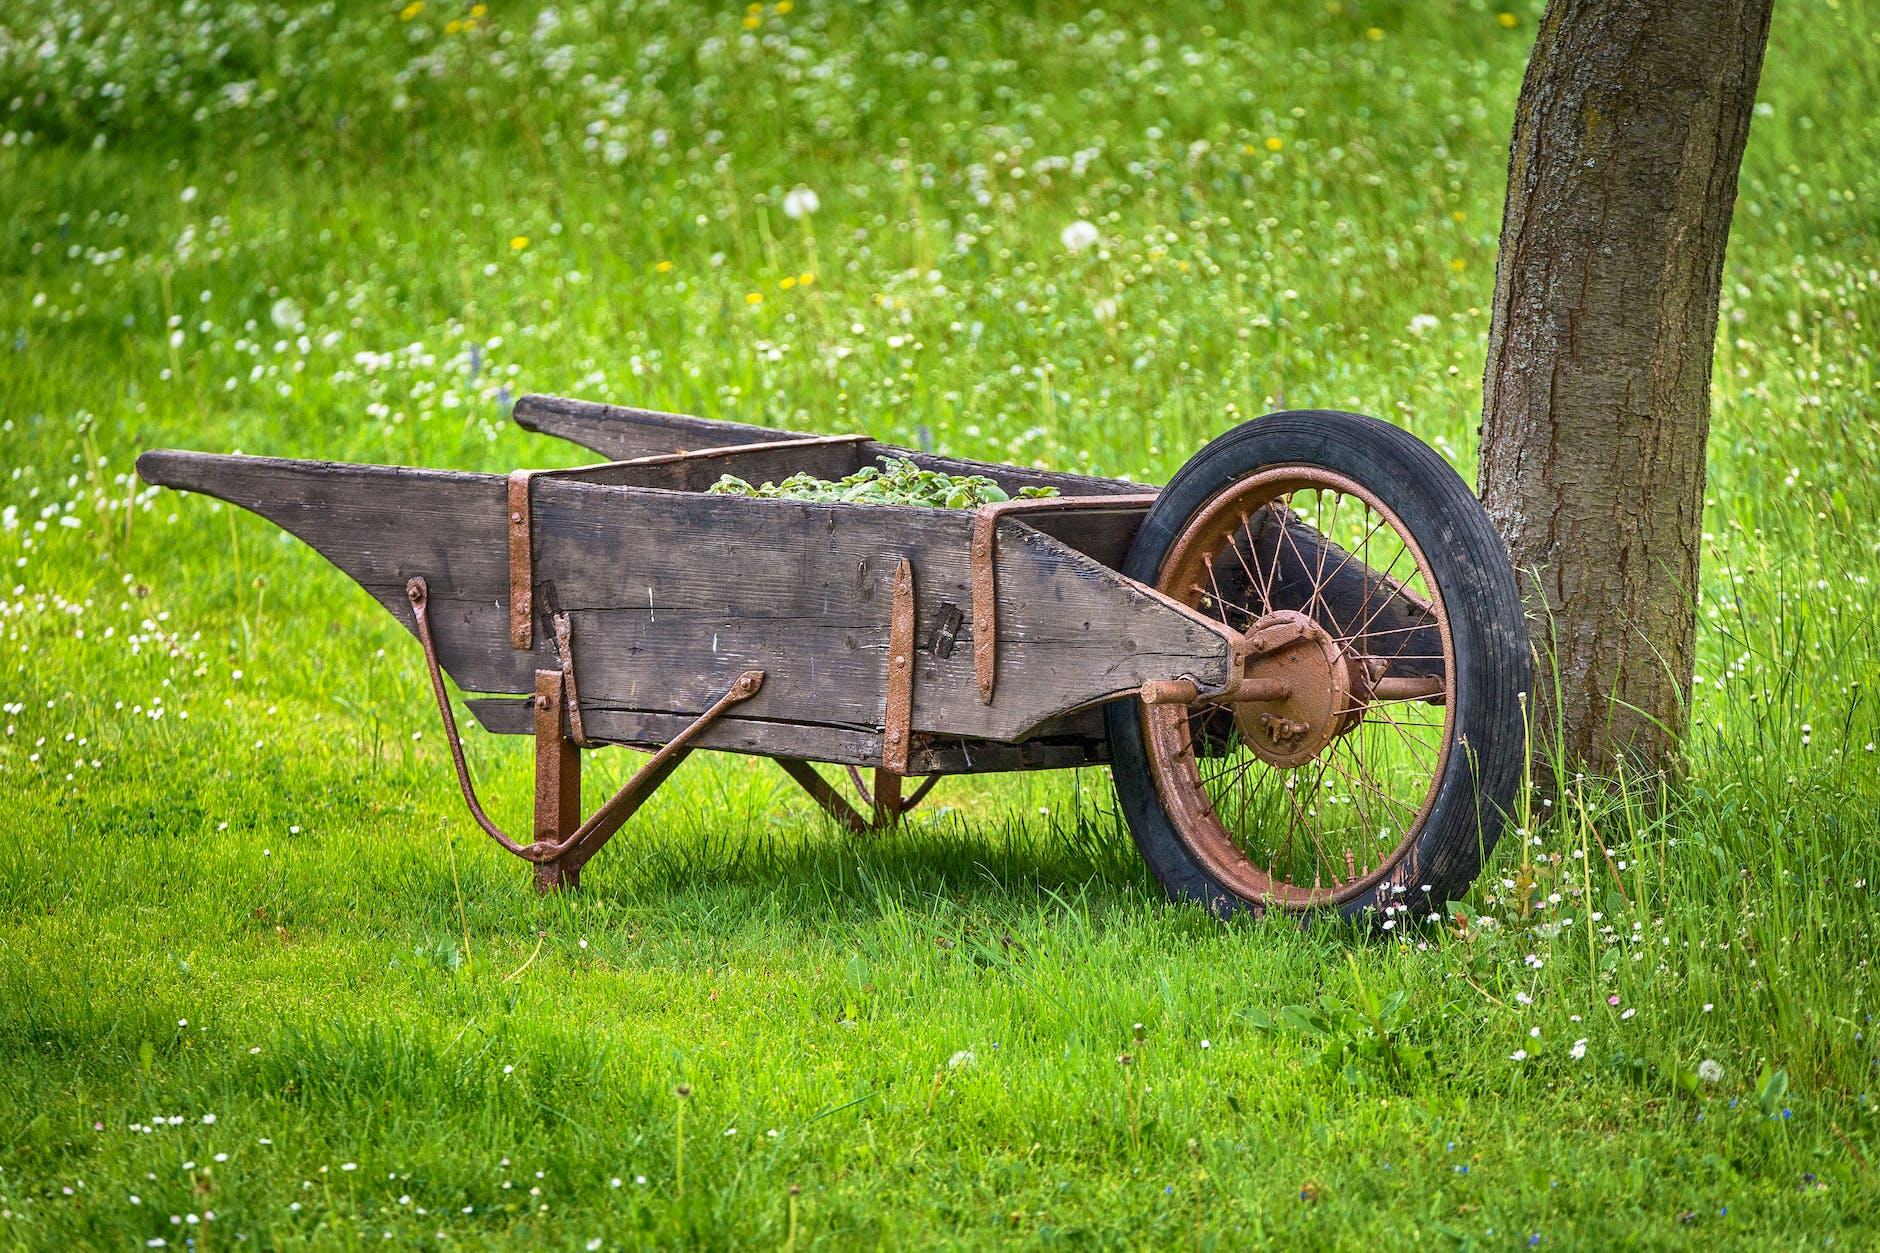 11 Handy Garden Carts For Hauling | Gardening Tool Ideas